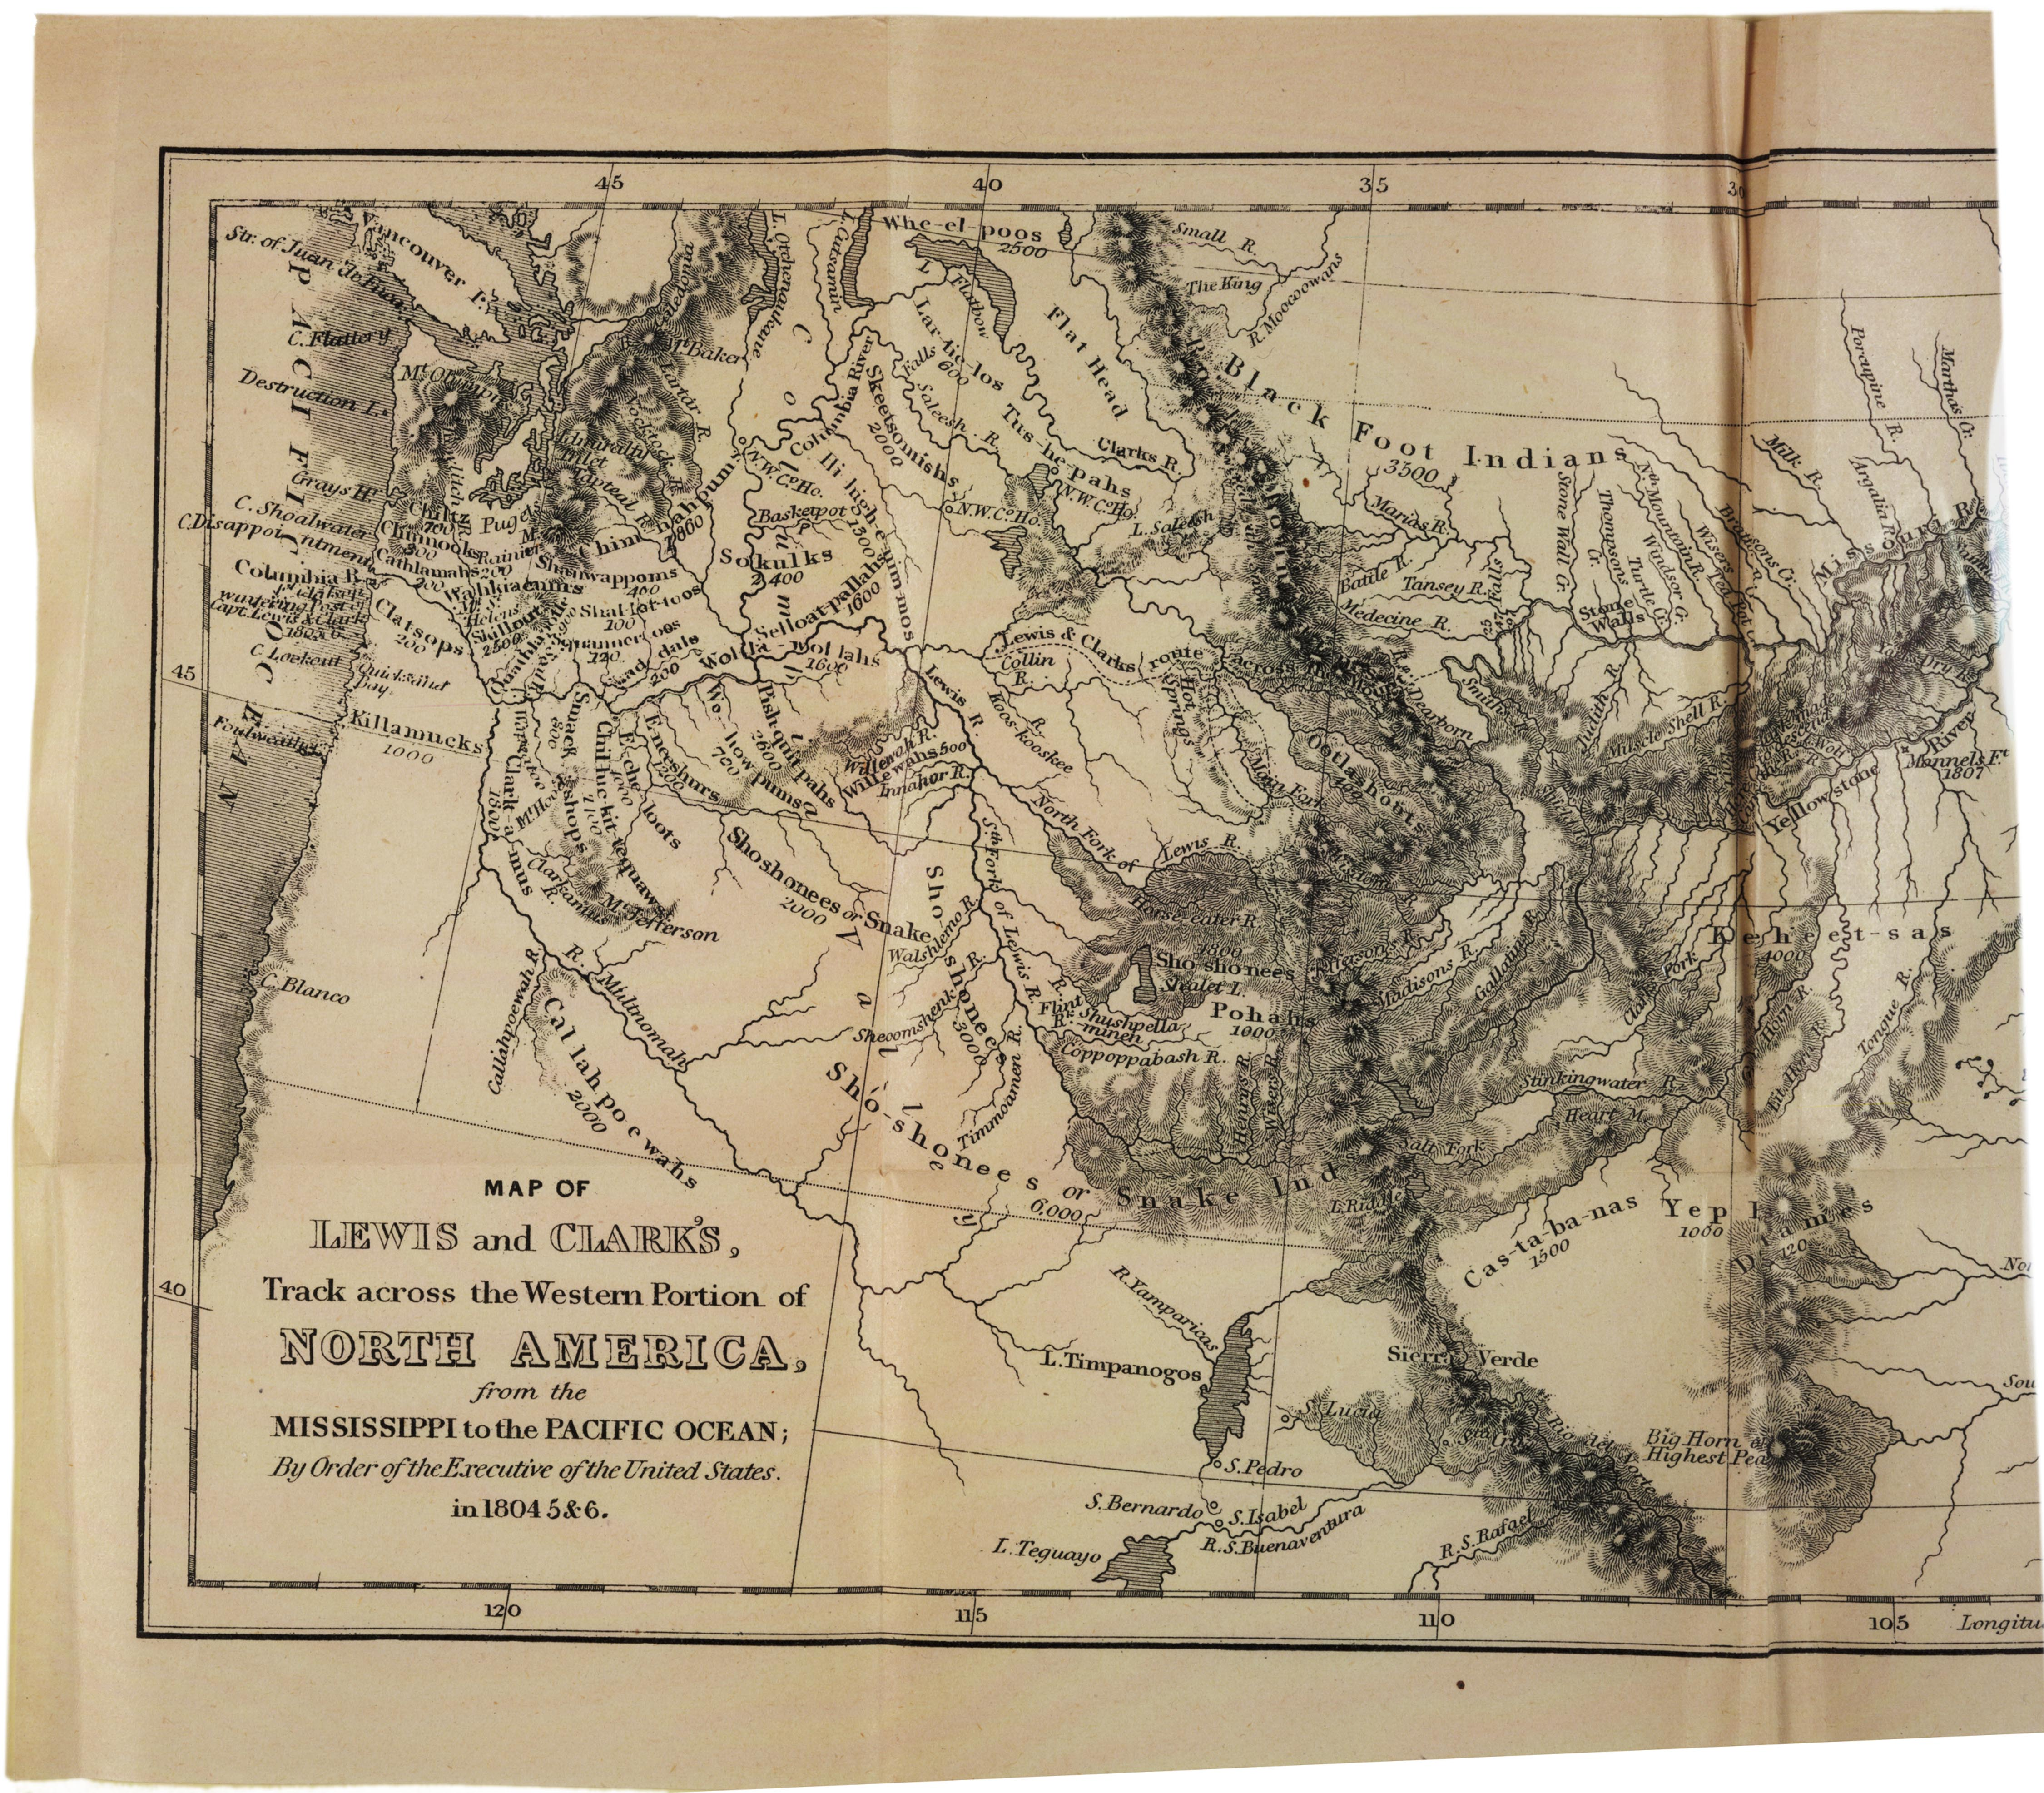 A Map of the Louisiana Territory, 1814. (Gilder Lehrman Collection)